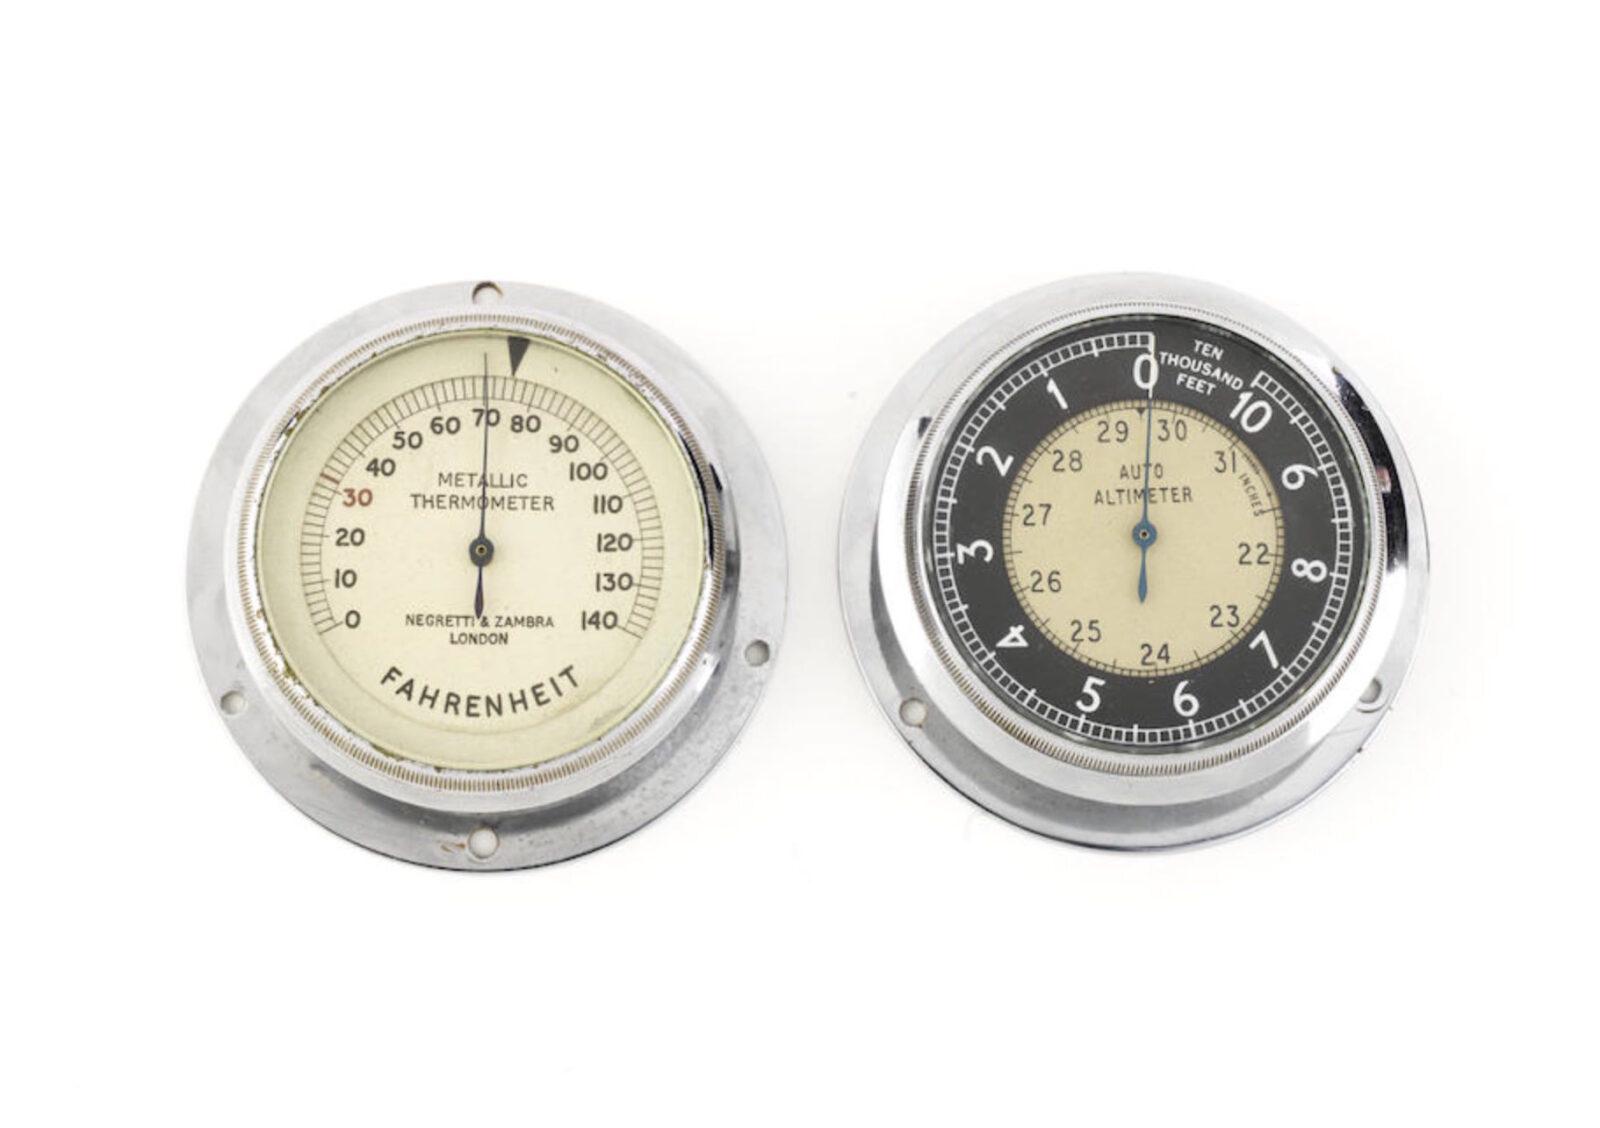 Racing Dashboard Instruments 1600x1128 - 1930s-Era Dashboard Instruments